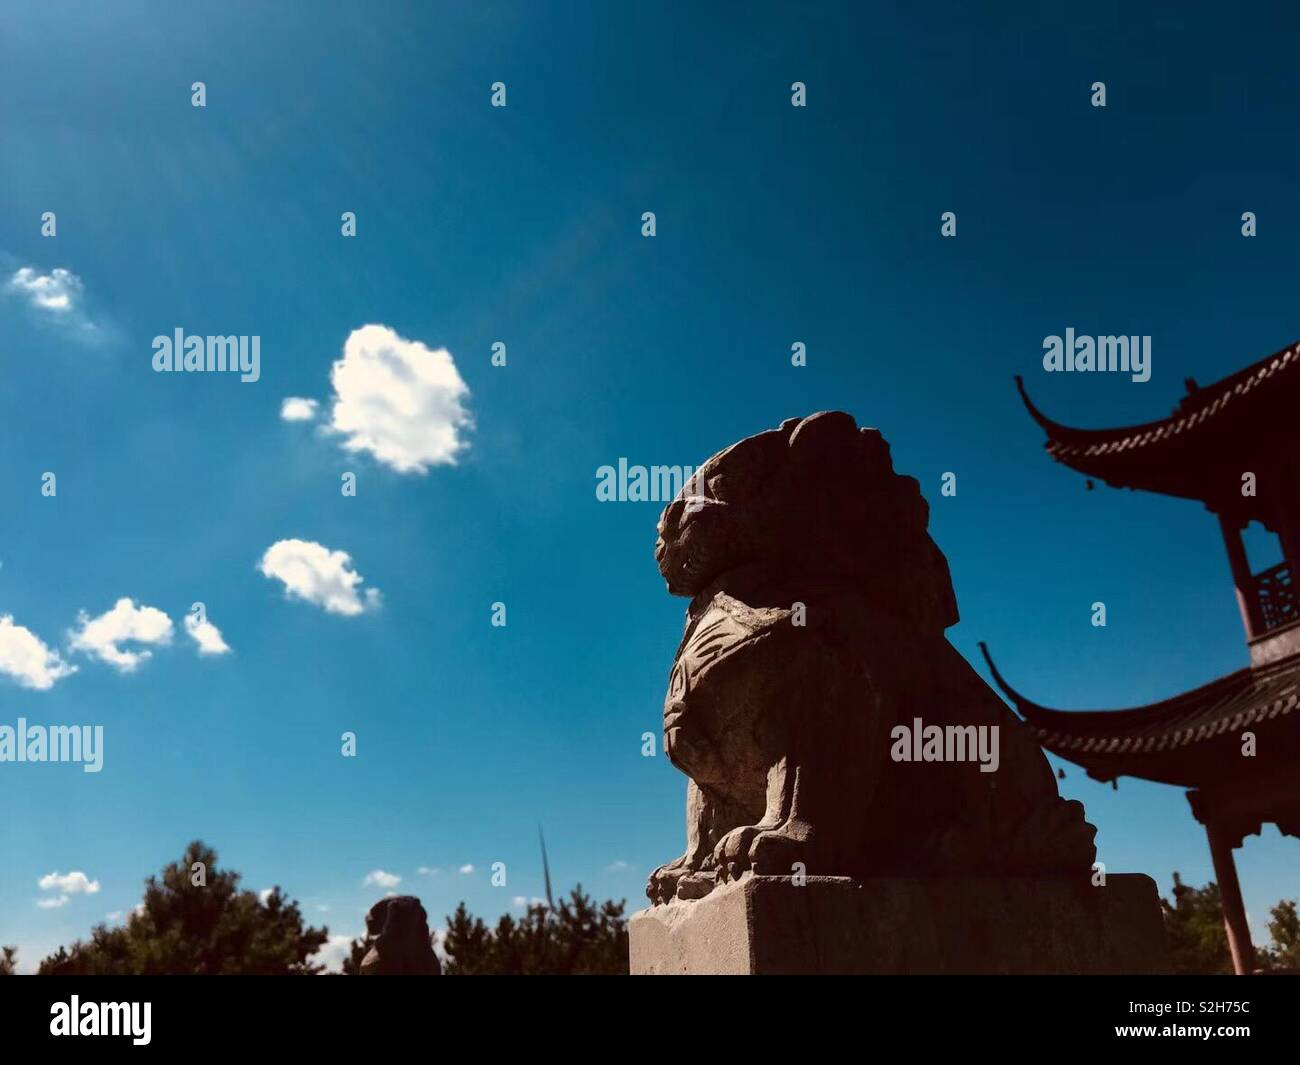 Blue Sky en Rudong Ciudad. La cultura china 💥 Imagen De Stock